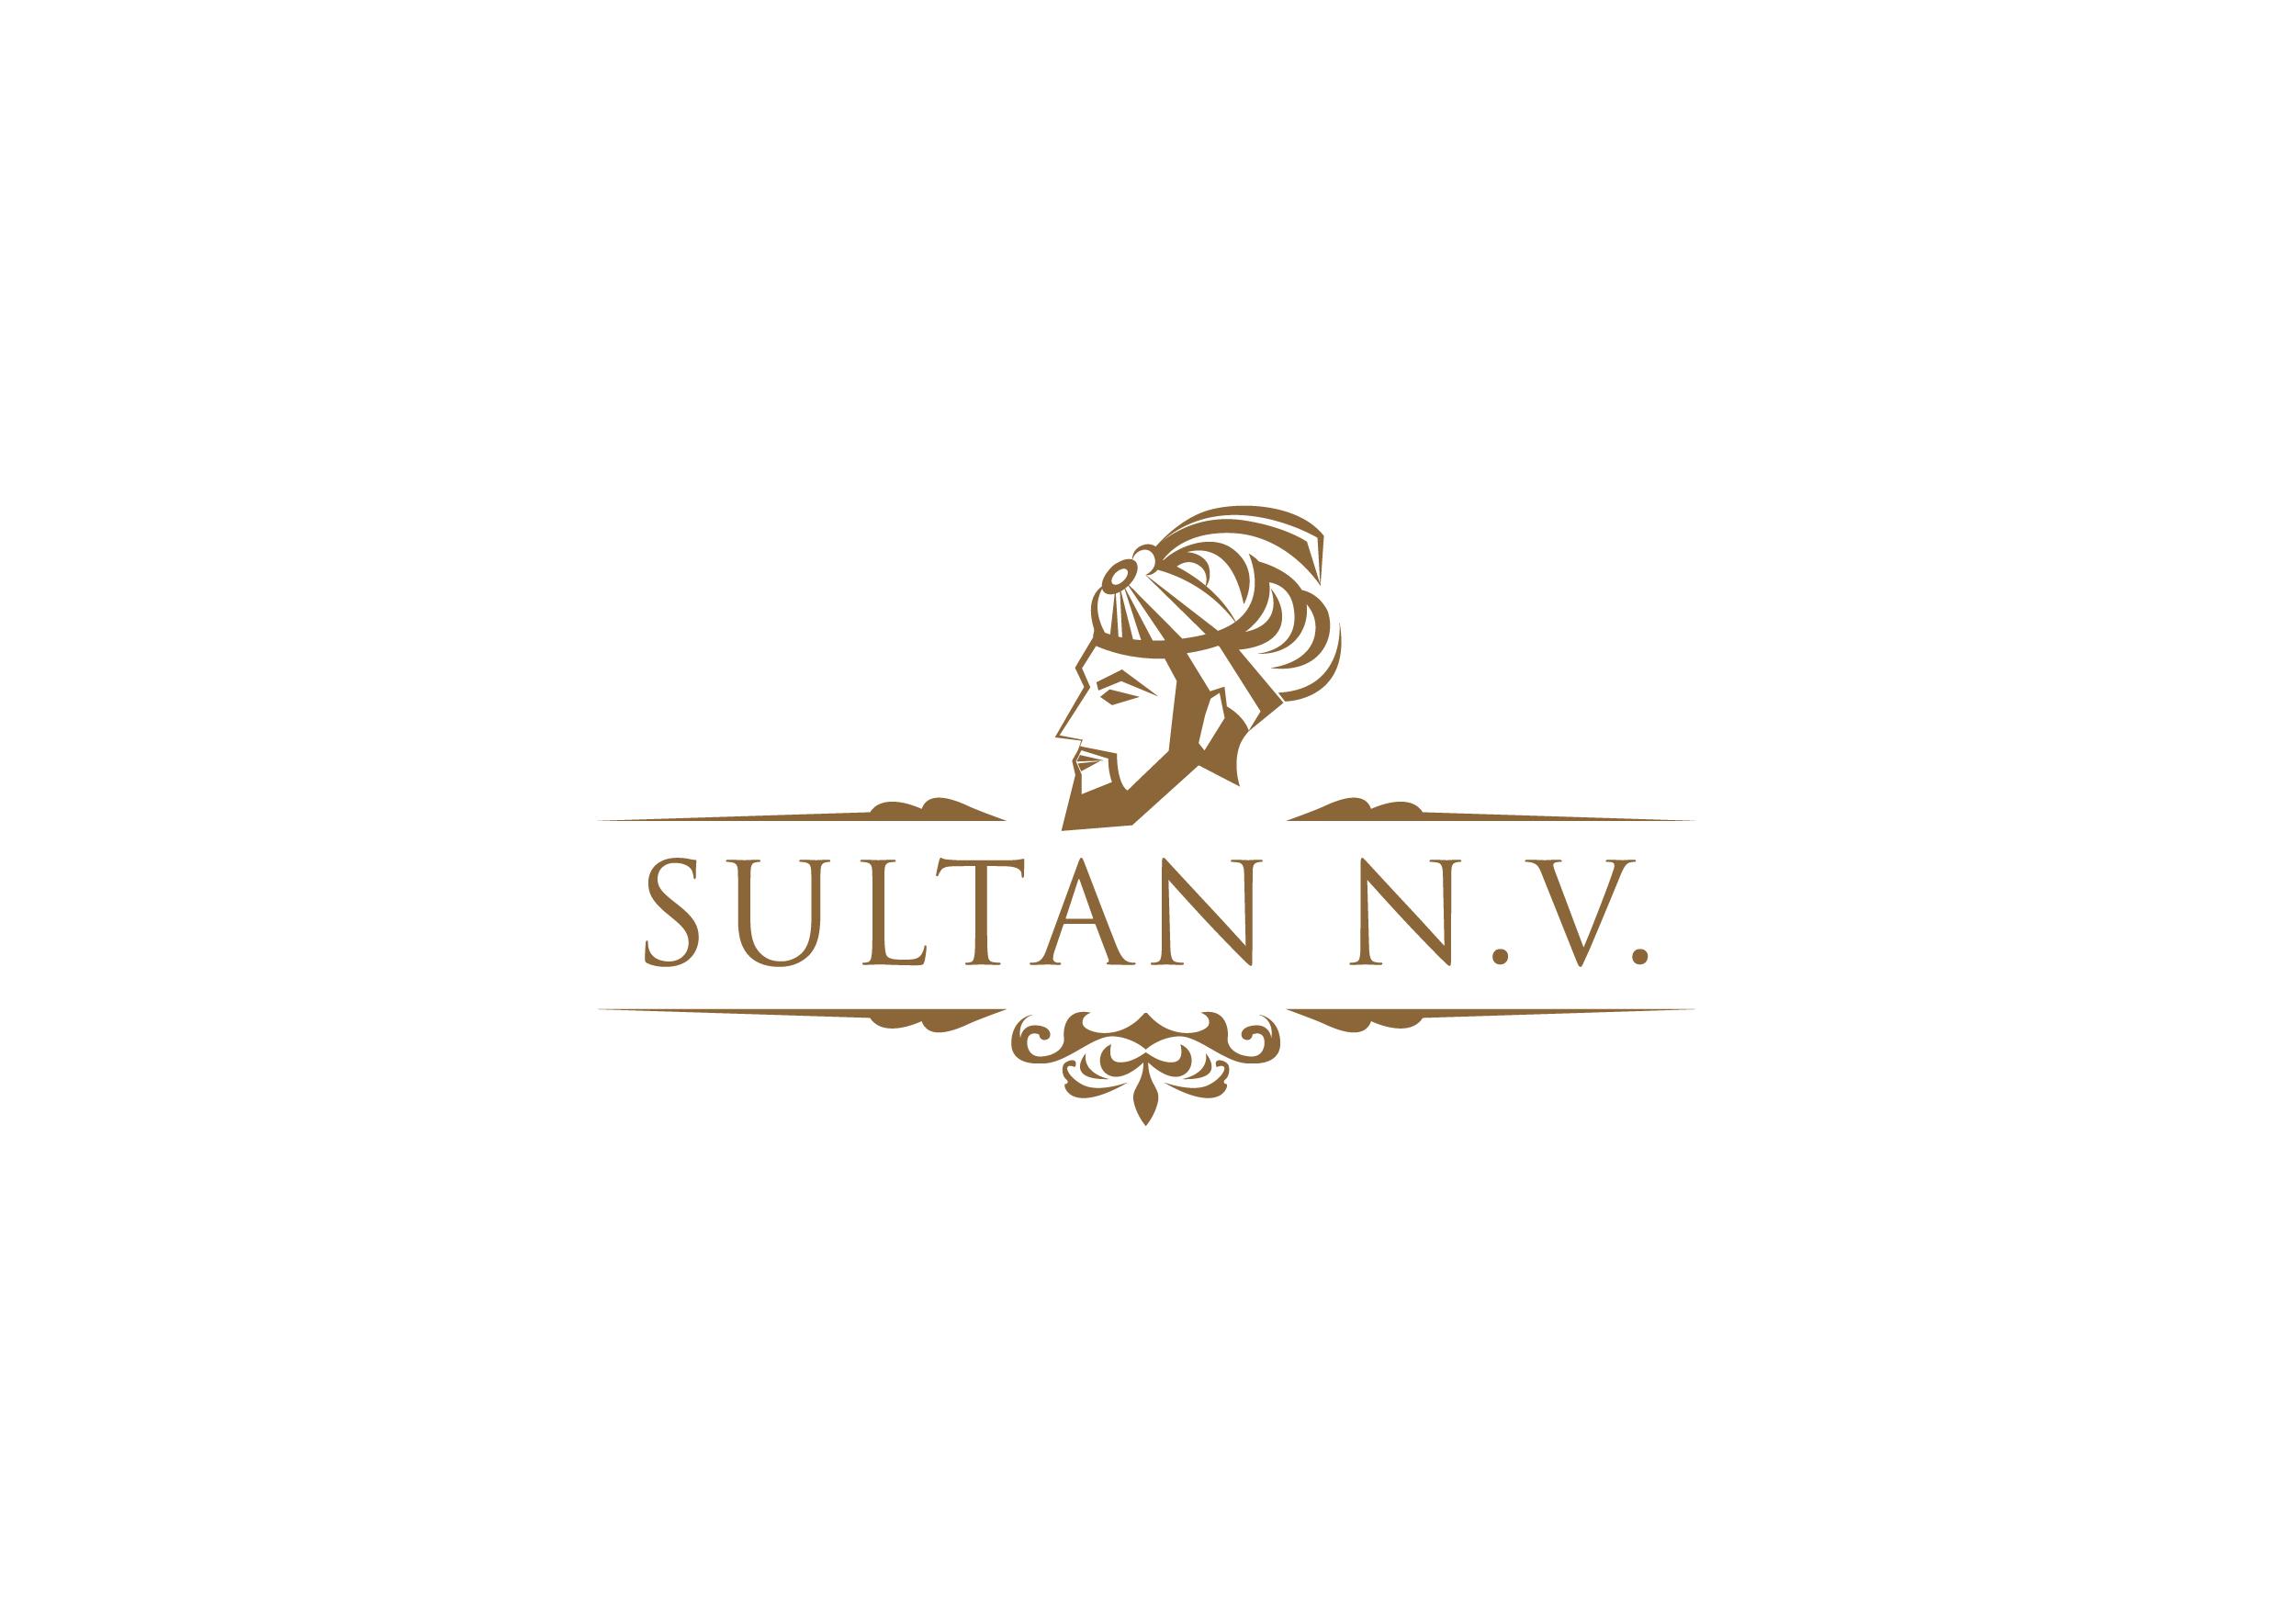 Sultan-NV-logo-02